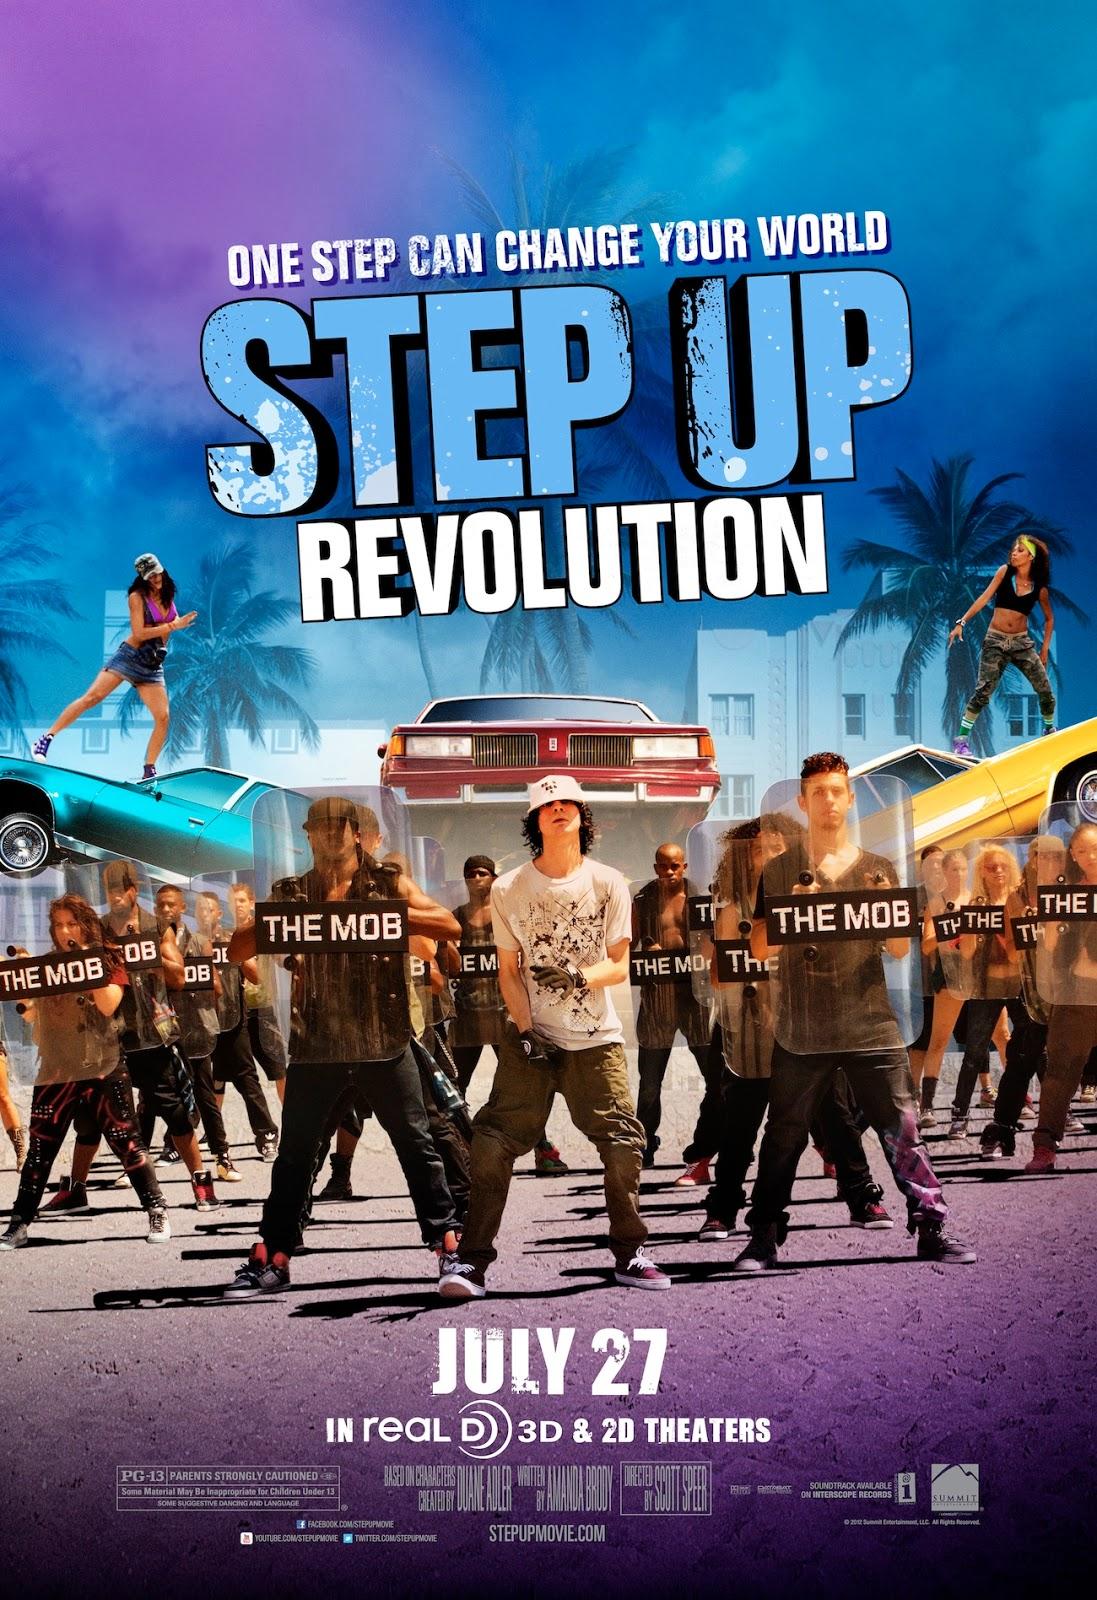 Step Up 4 Revolution Dvdripmegalatino Identi